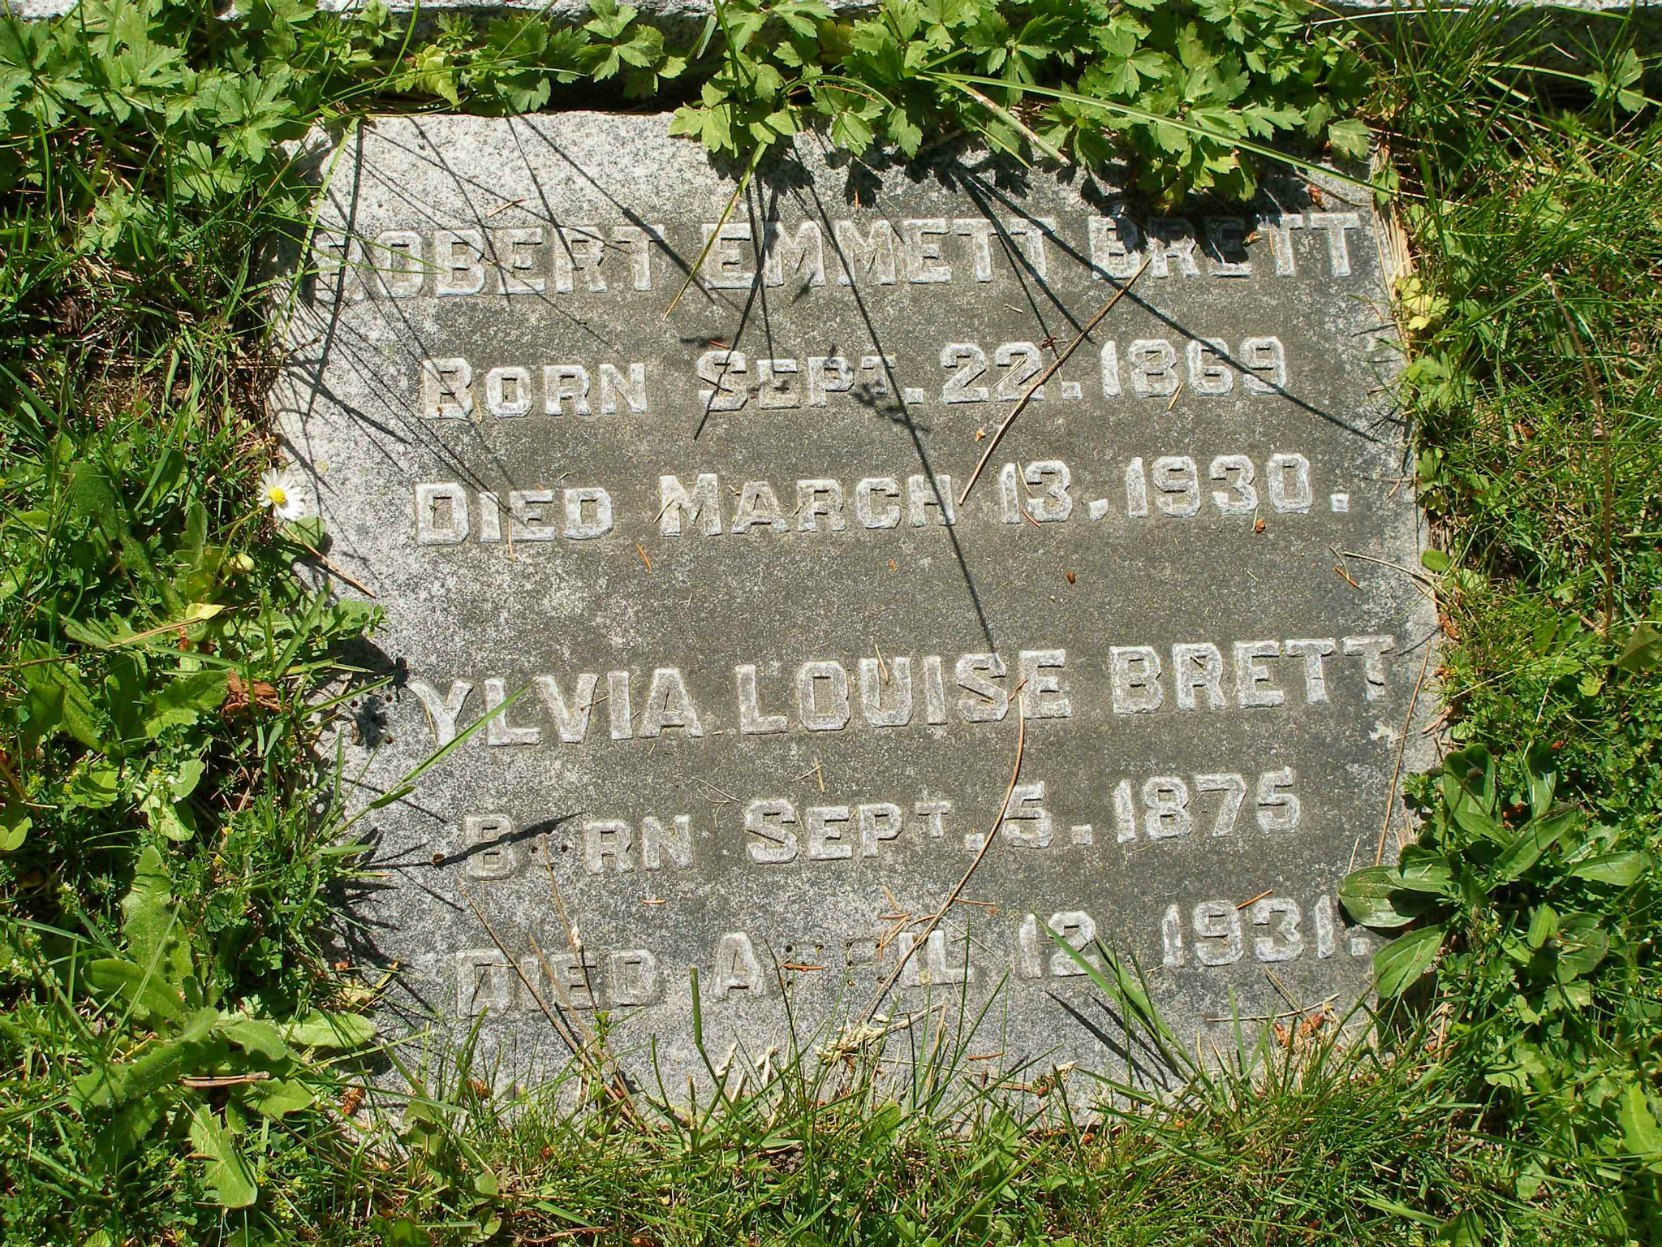 Robert Emmett Brett grave marker, Ross Bay Cemetery. Victoria, B.C.